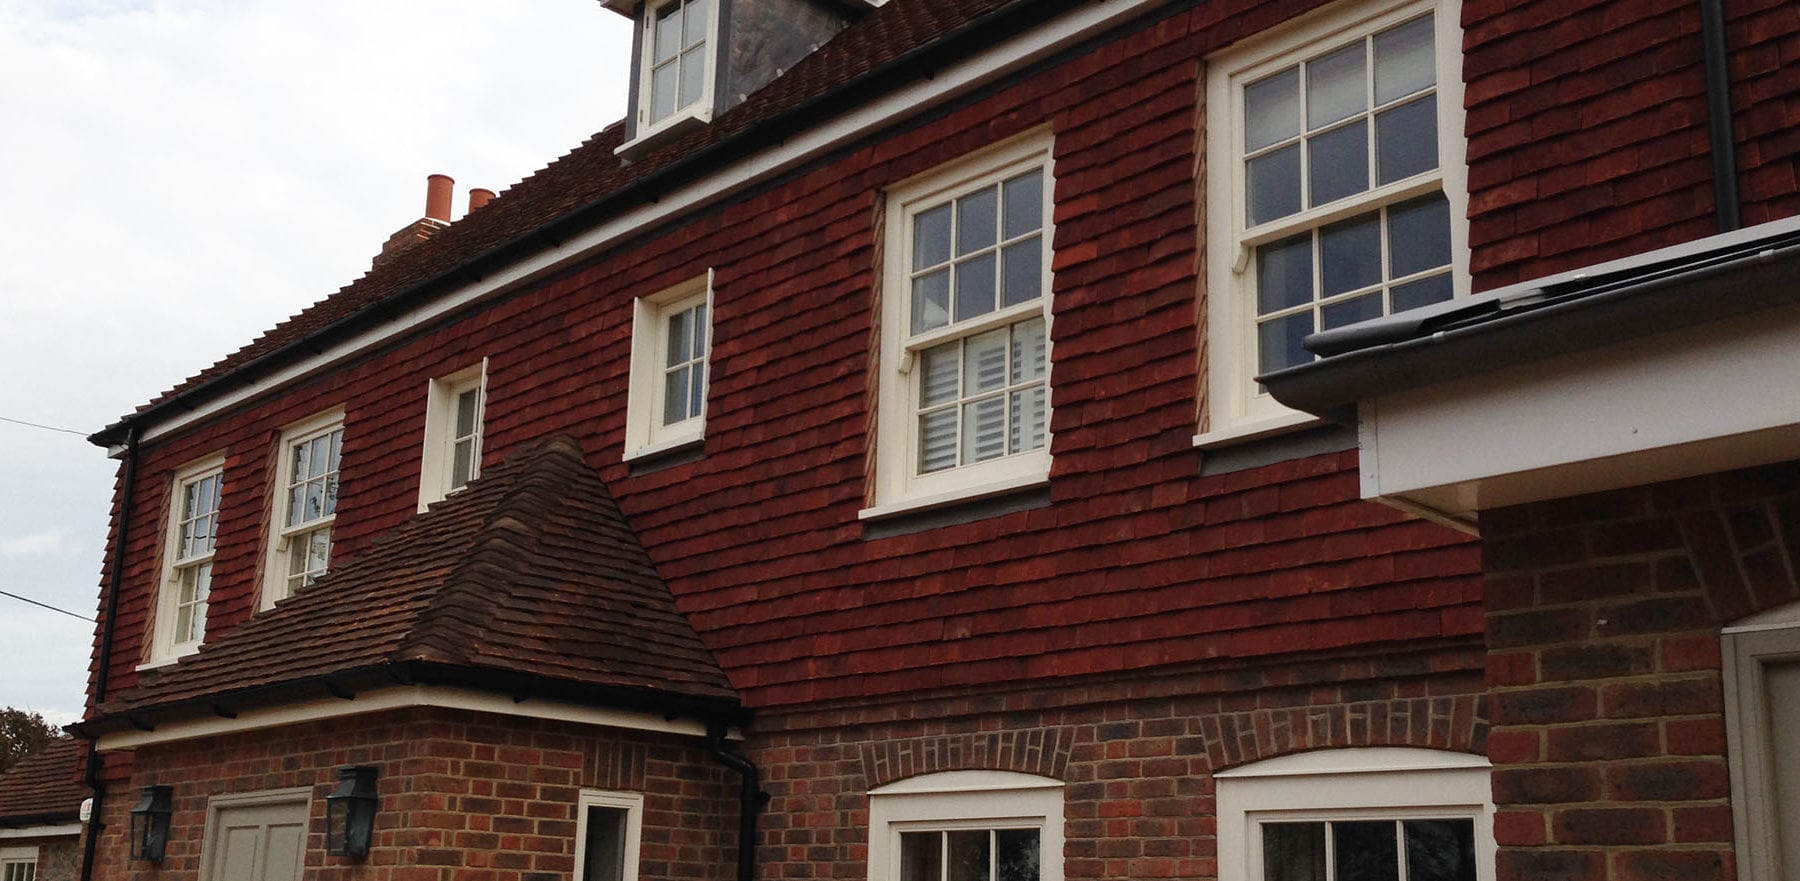 Lifestiles - Handmade Heather Clay Roof Tiles - Chidham, England 4